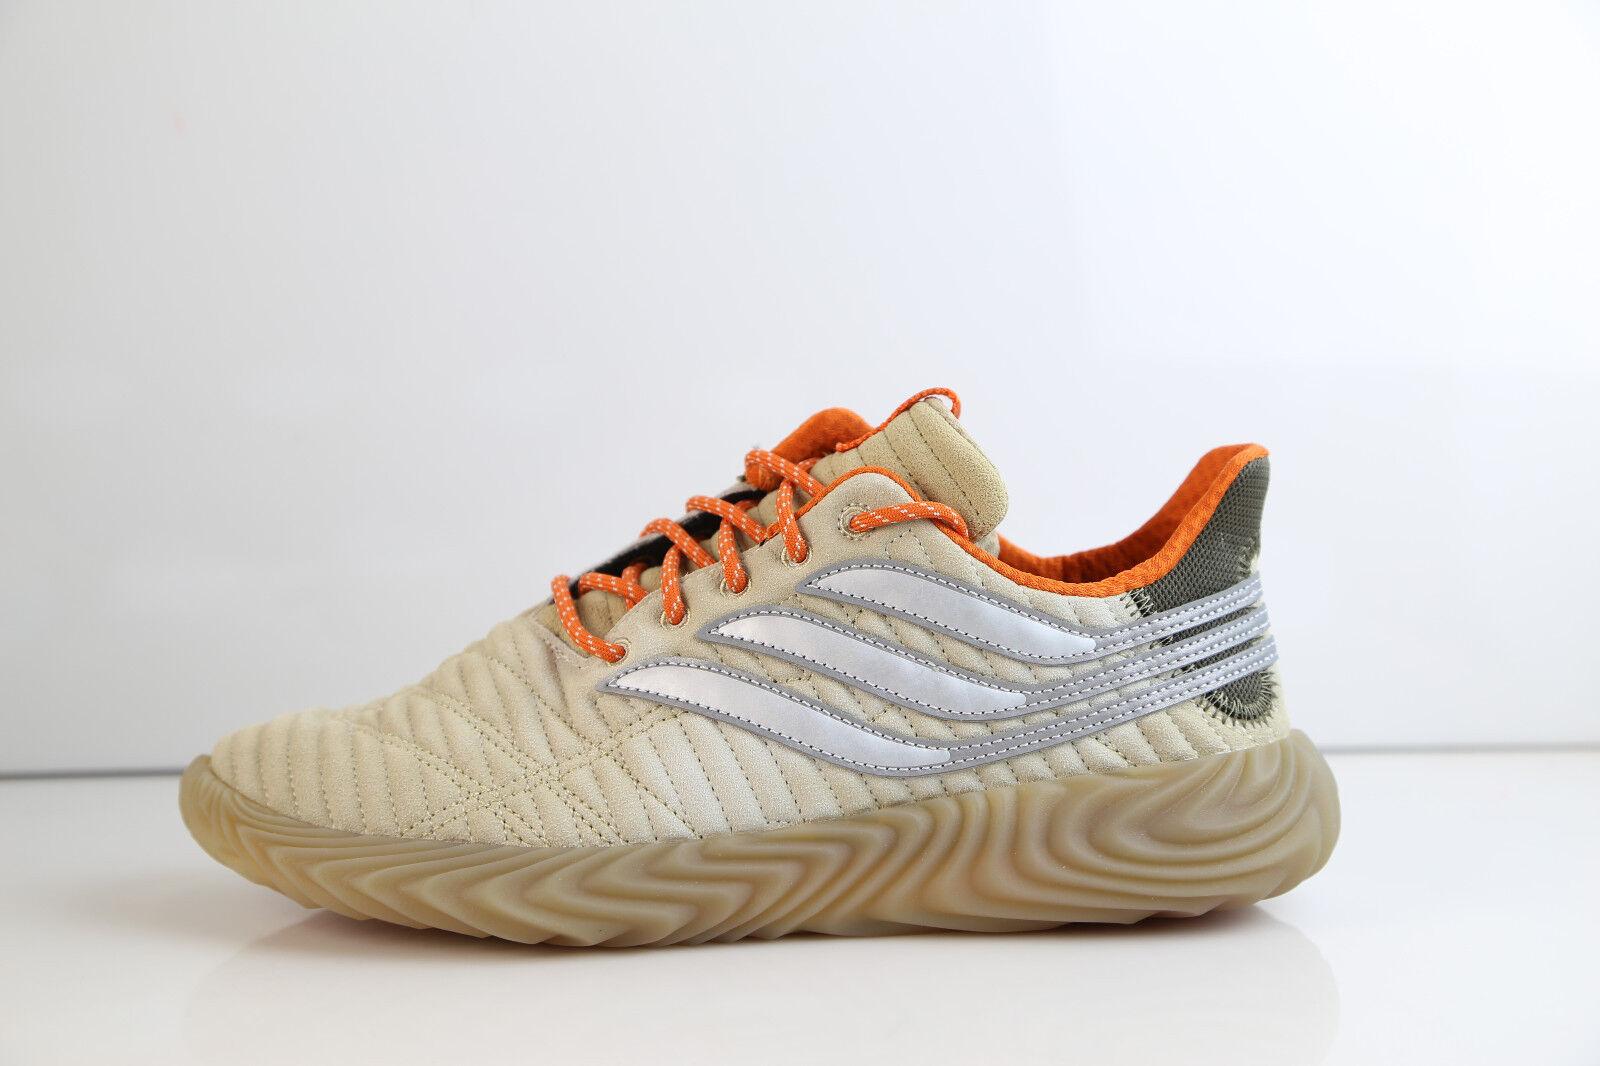 3d48059e6 Adidas x bodega Goma Naranja Solar BC0818 8-10 consorcio hueso sabakov  nvooxk7120-zapatos nuevos